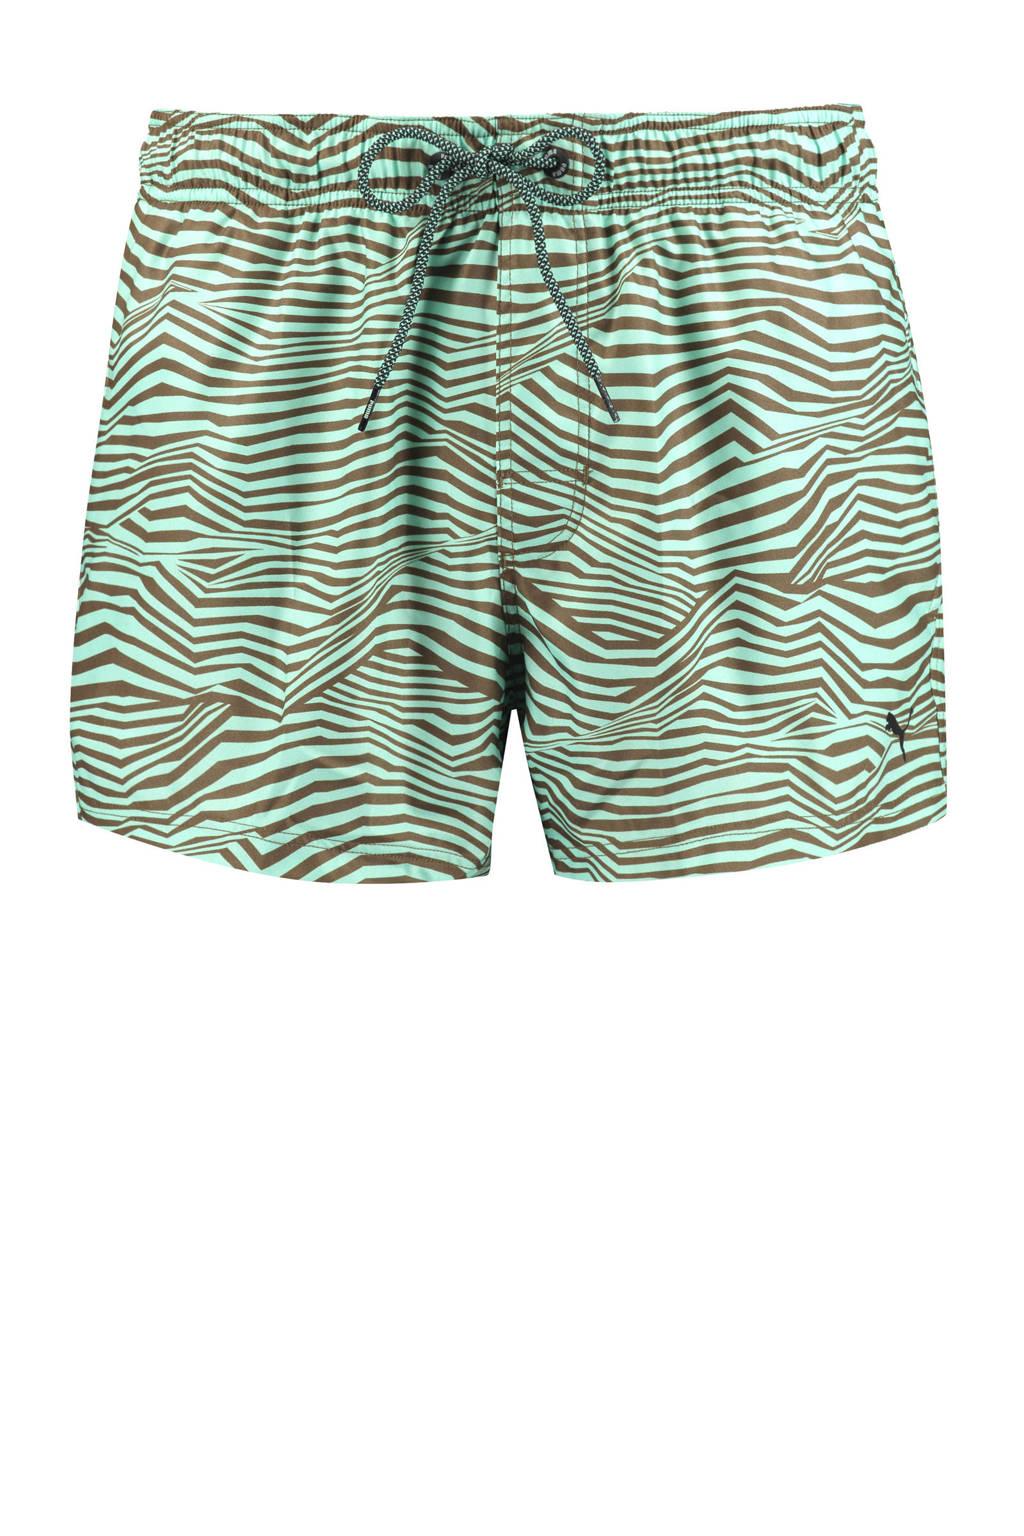 Puma zwemshort met all over print mintgroen, Mintgroen/groen